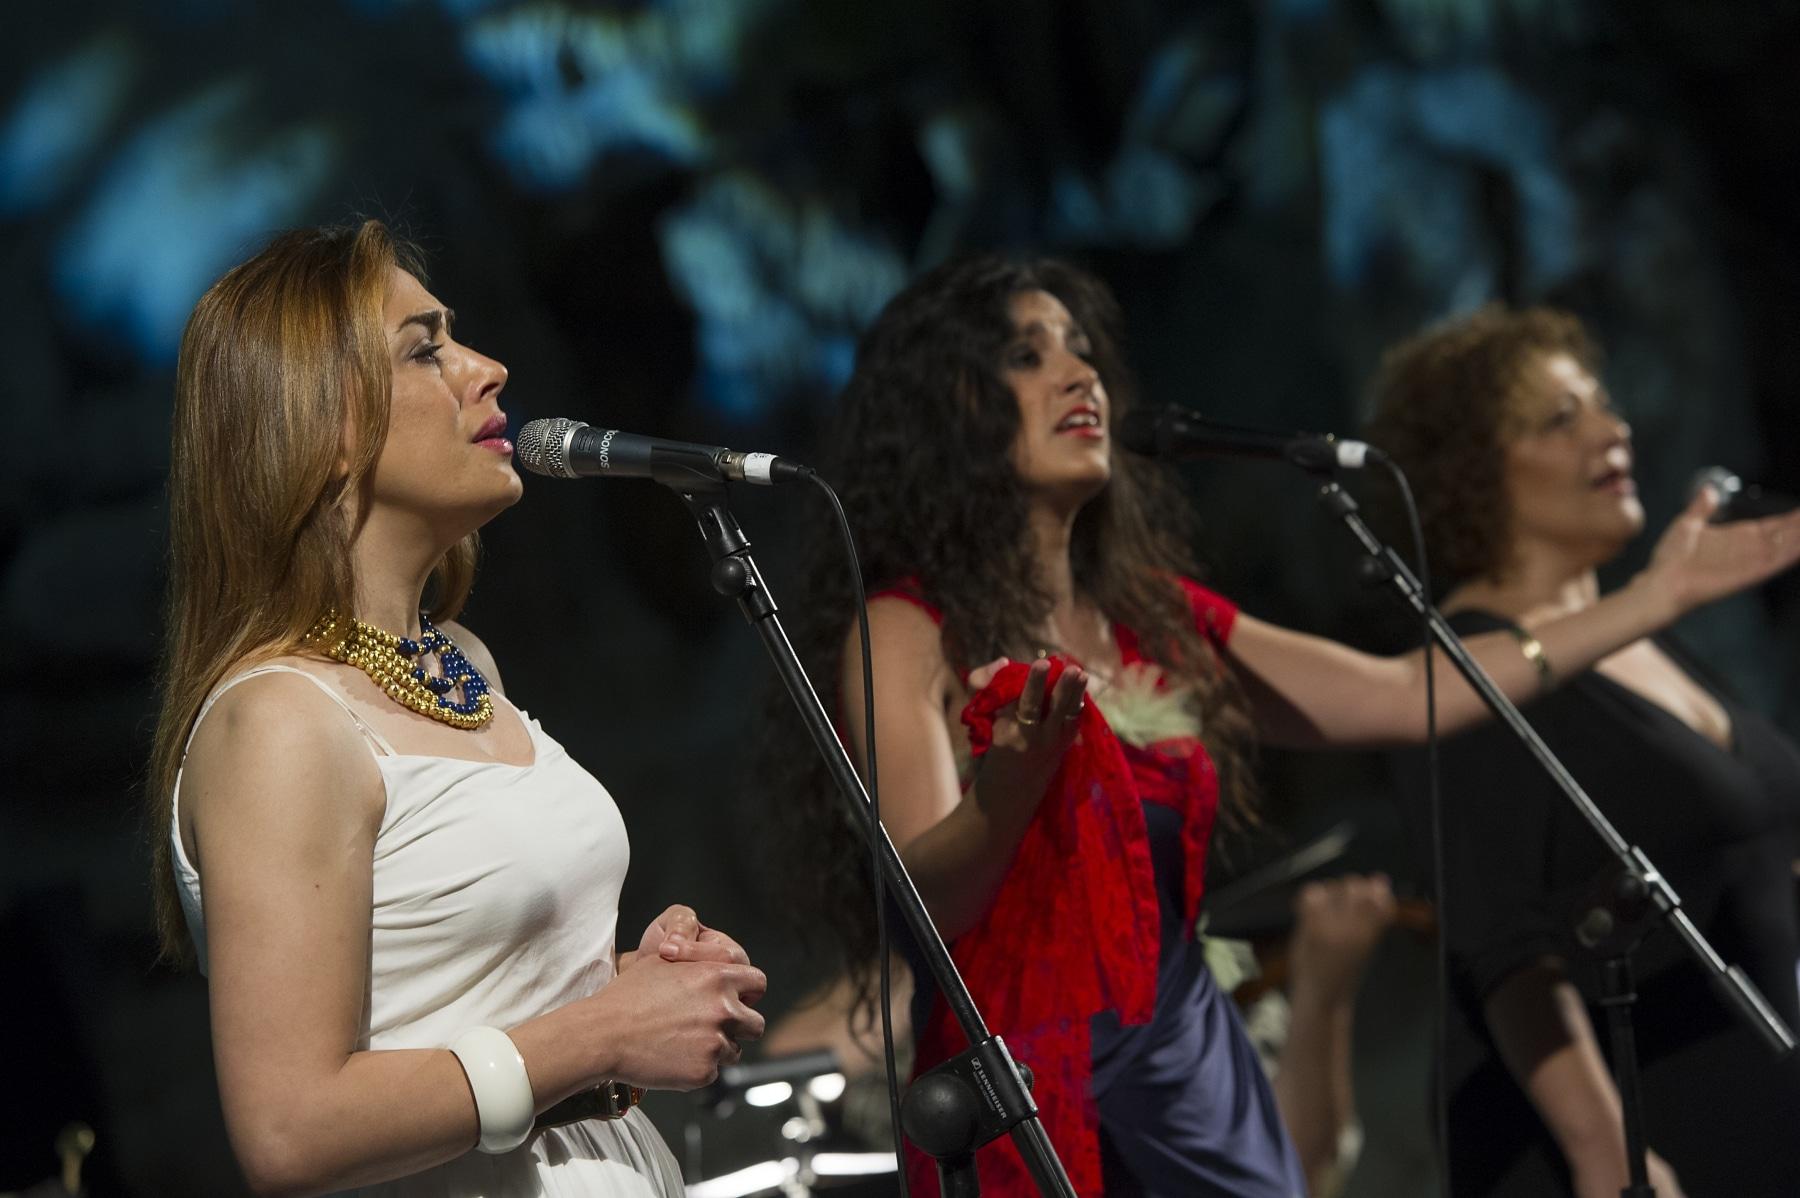 gibraltar-world-music-festival-dia-1-the-sweet-canary-ensemble-47_9222693601_o